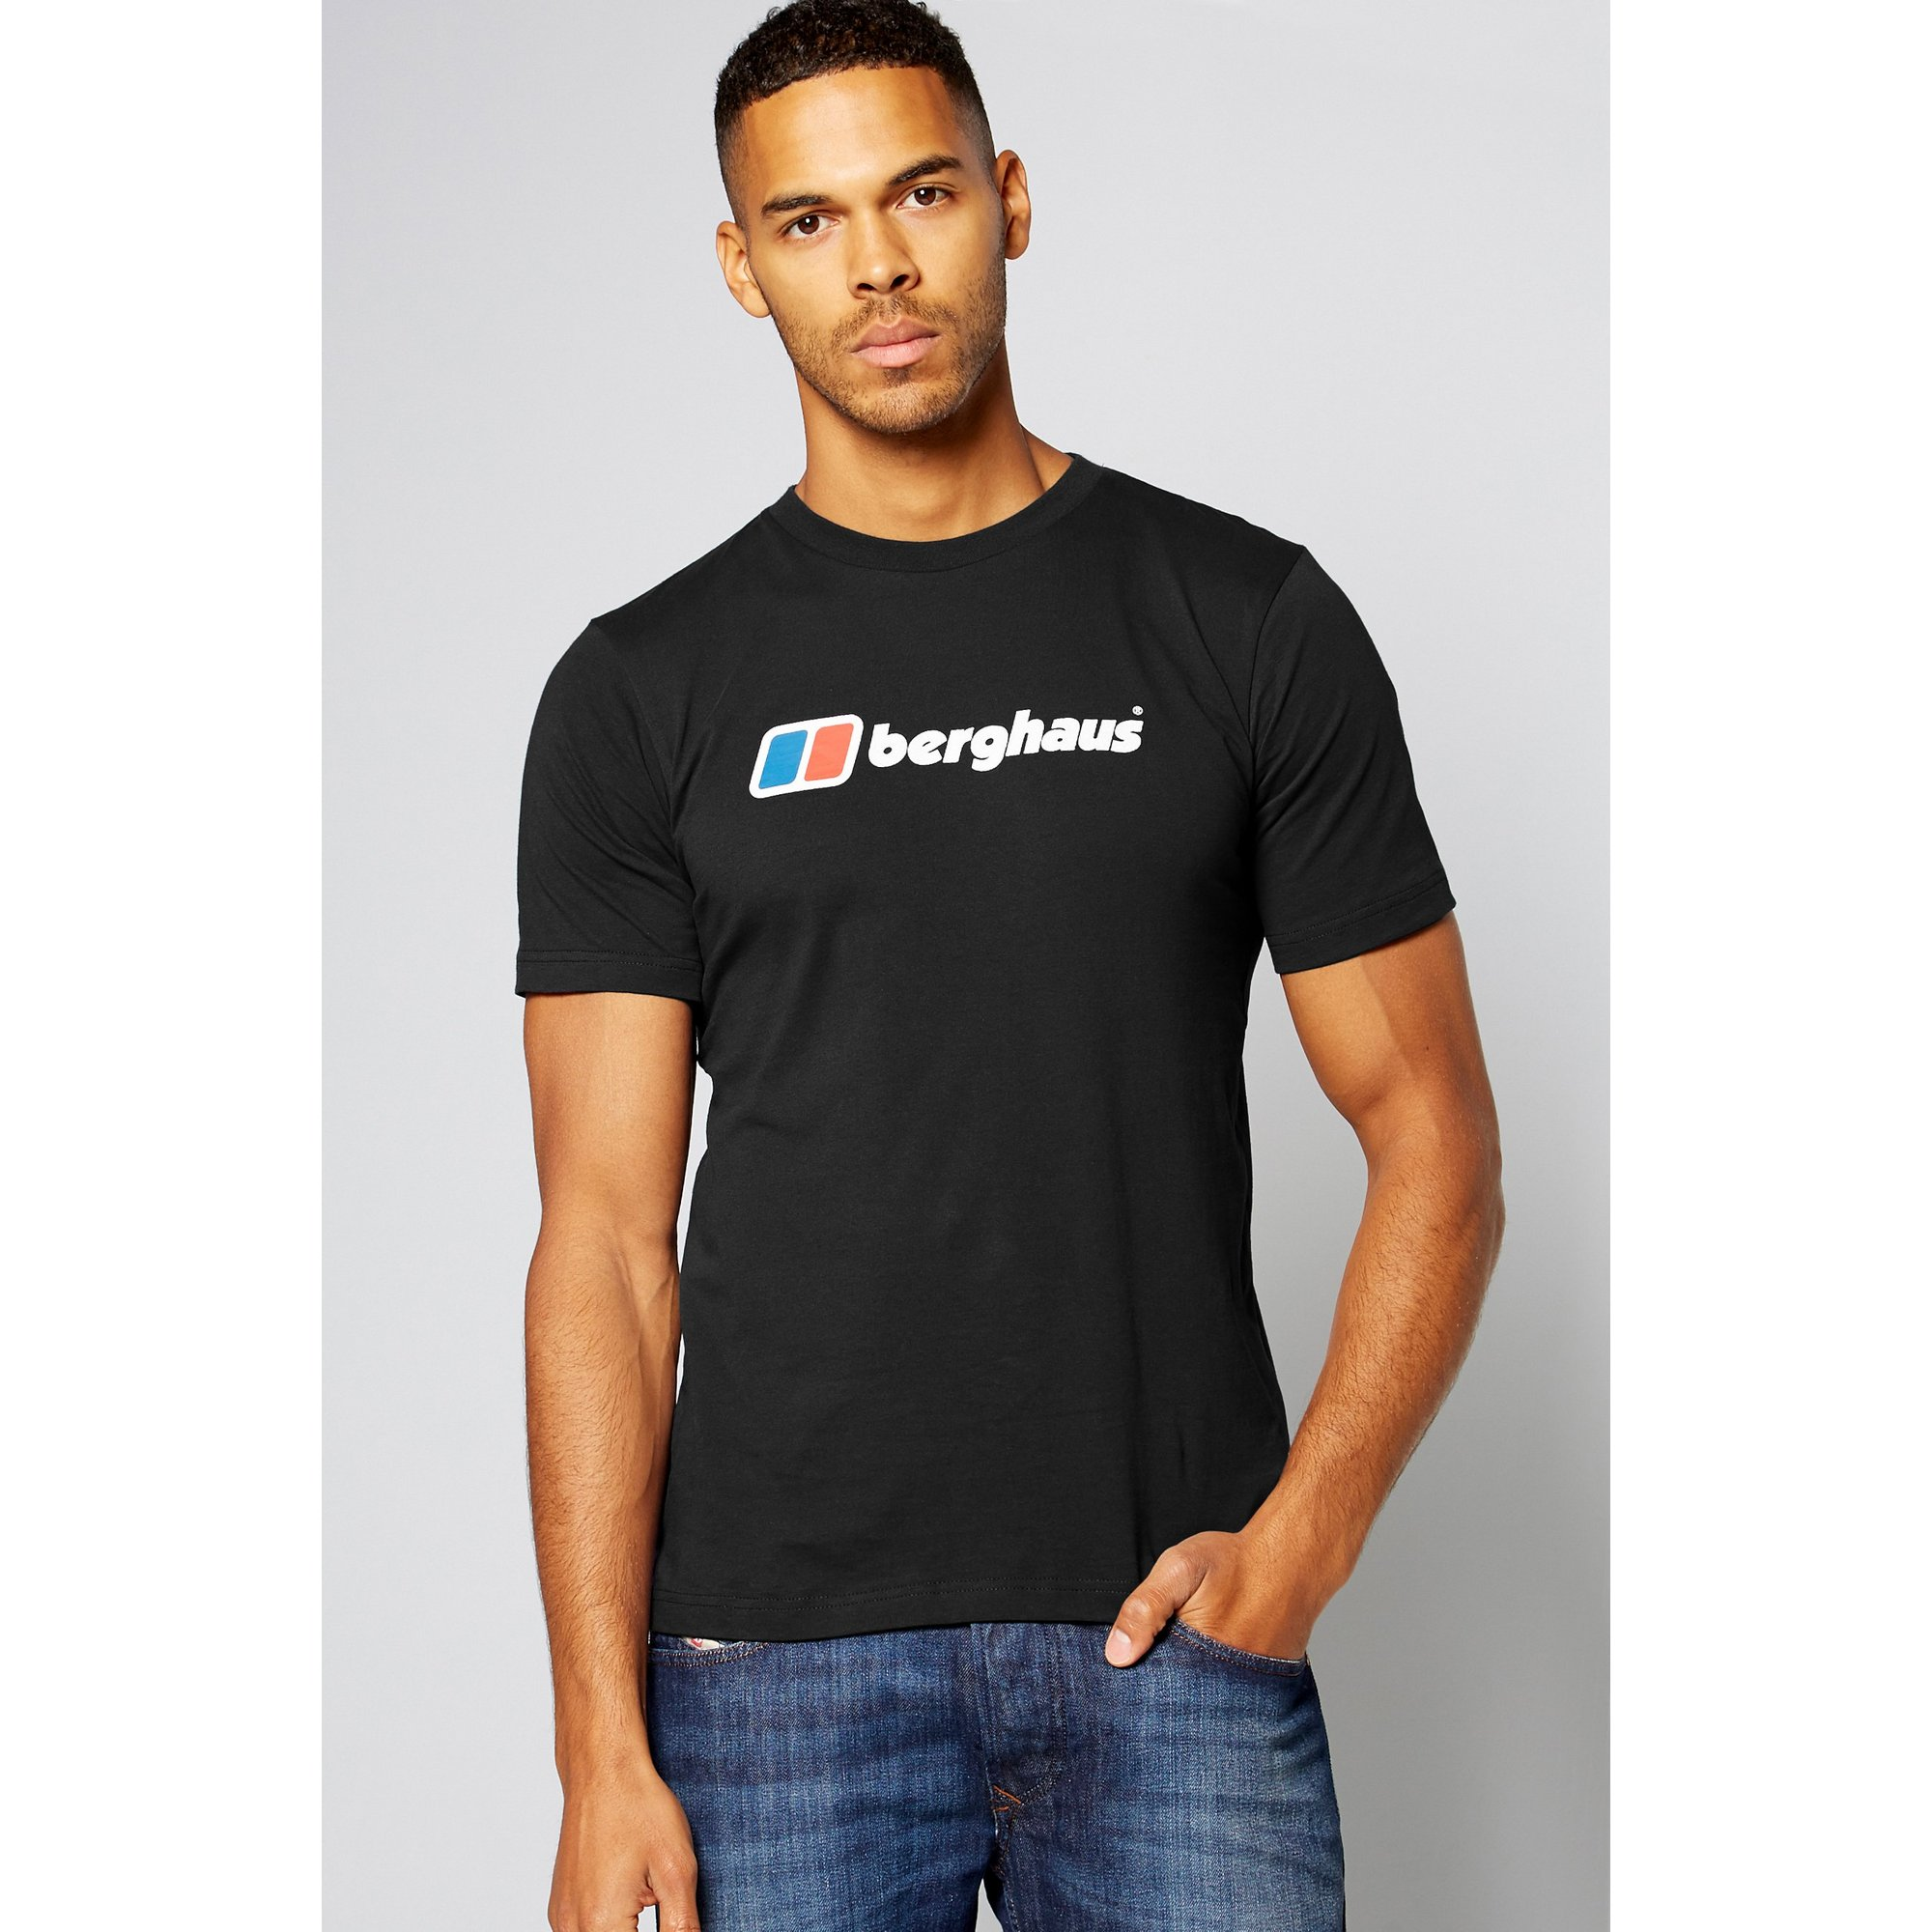 Image of Berghaus Big Corporate T-Shirt